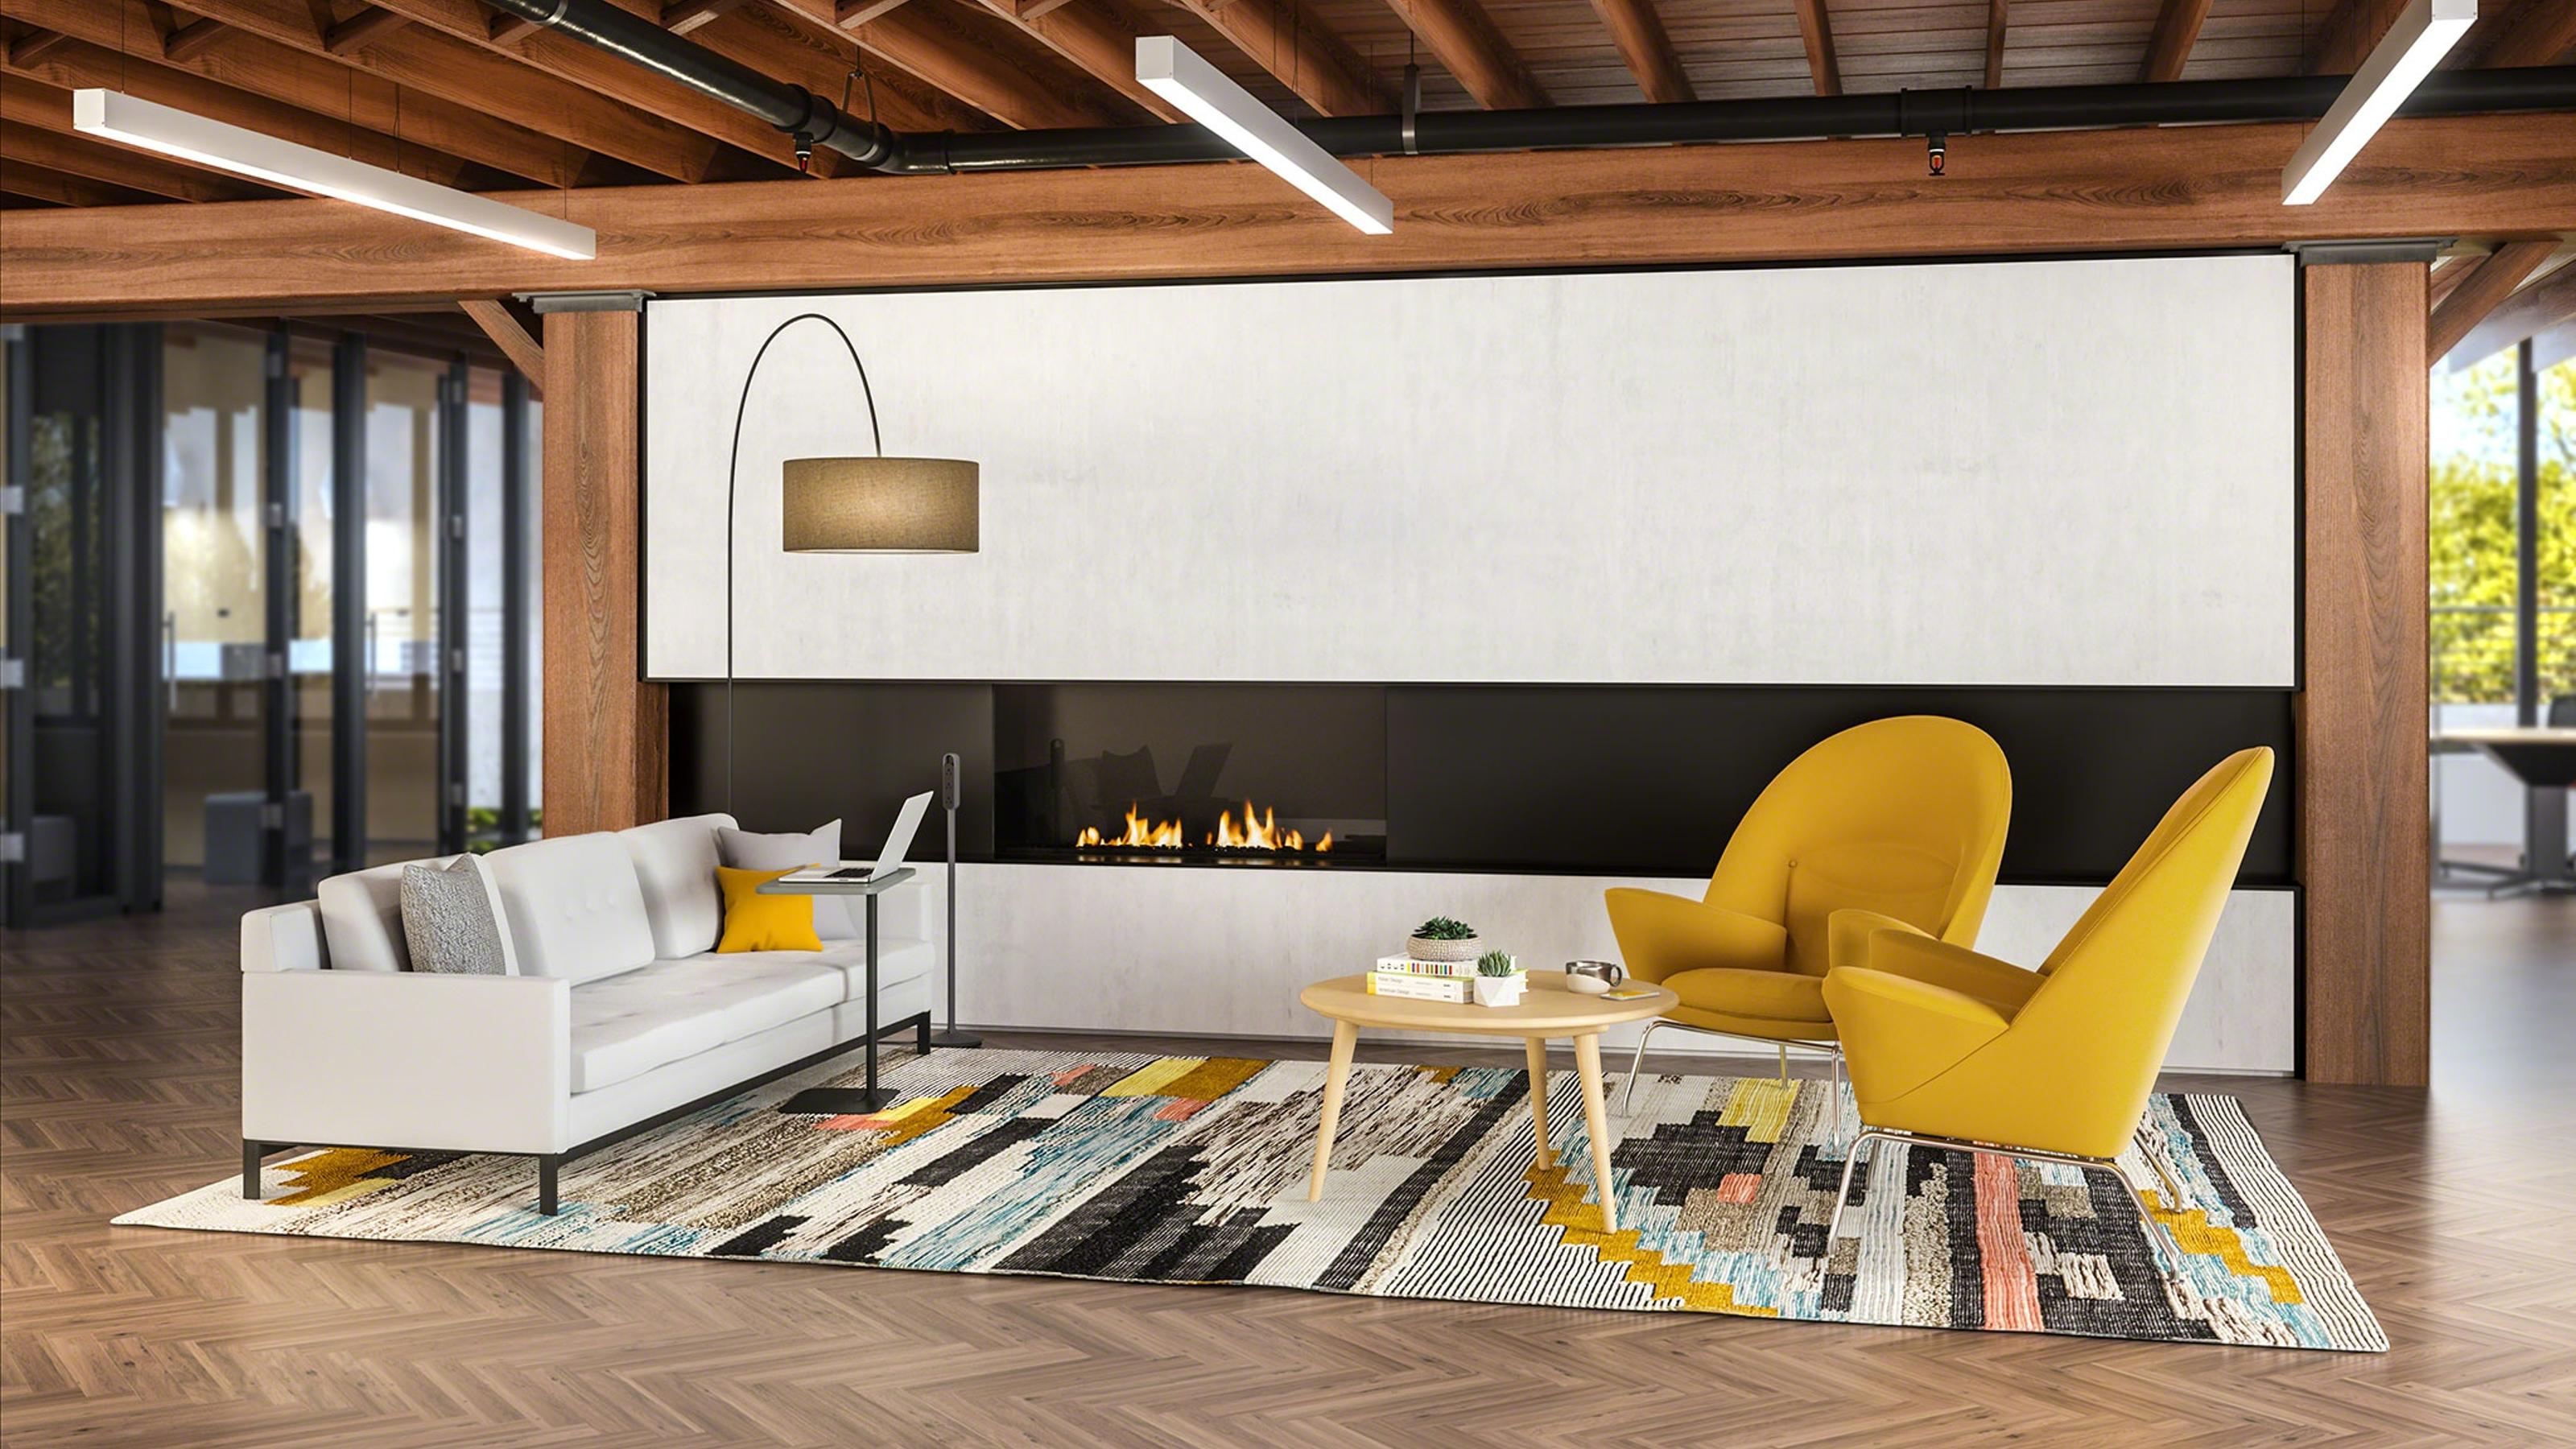 Inspiring Spaces Reinvigorate The Office